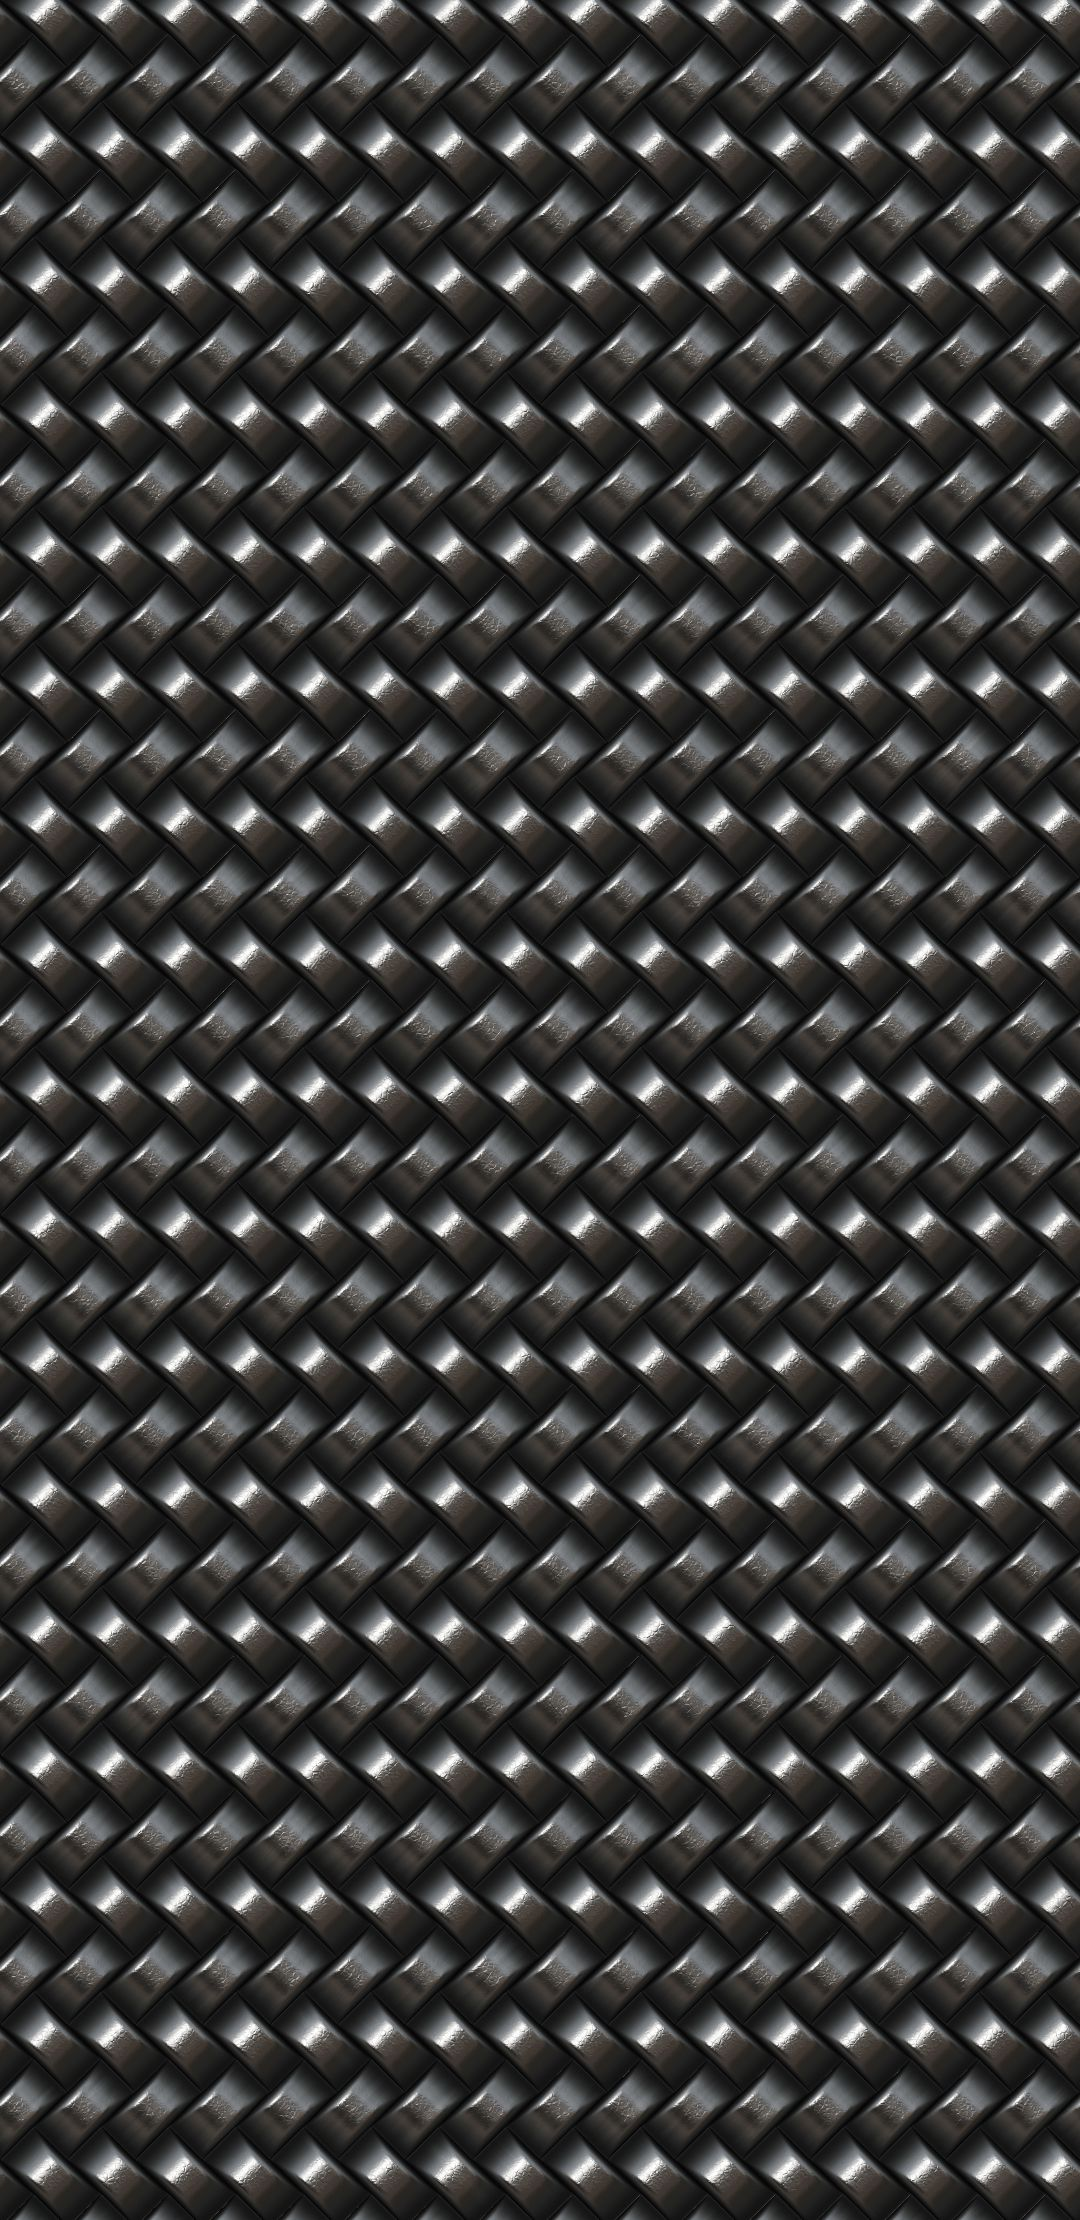 Dark Metal Mesh Galaxy Infinity Display Wallpaper Created By Angelo Sarnacchiaro Free D Hd Phone Wallpapers Phone Wallpaper Dont Touch My Phone Wallpapers